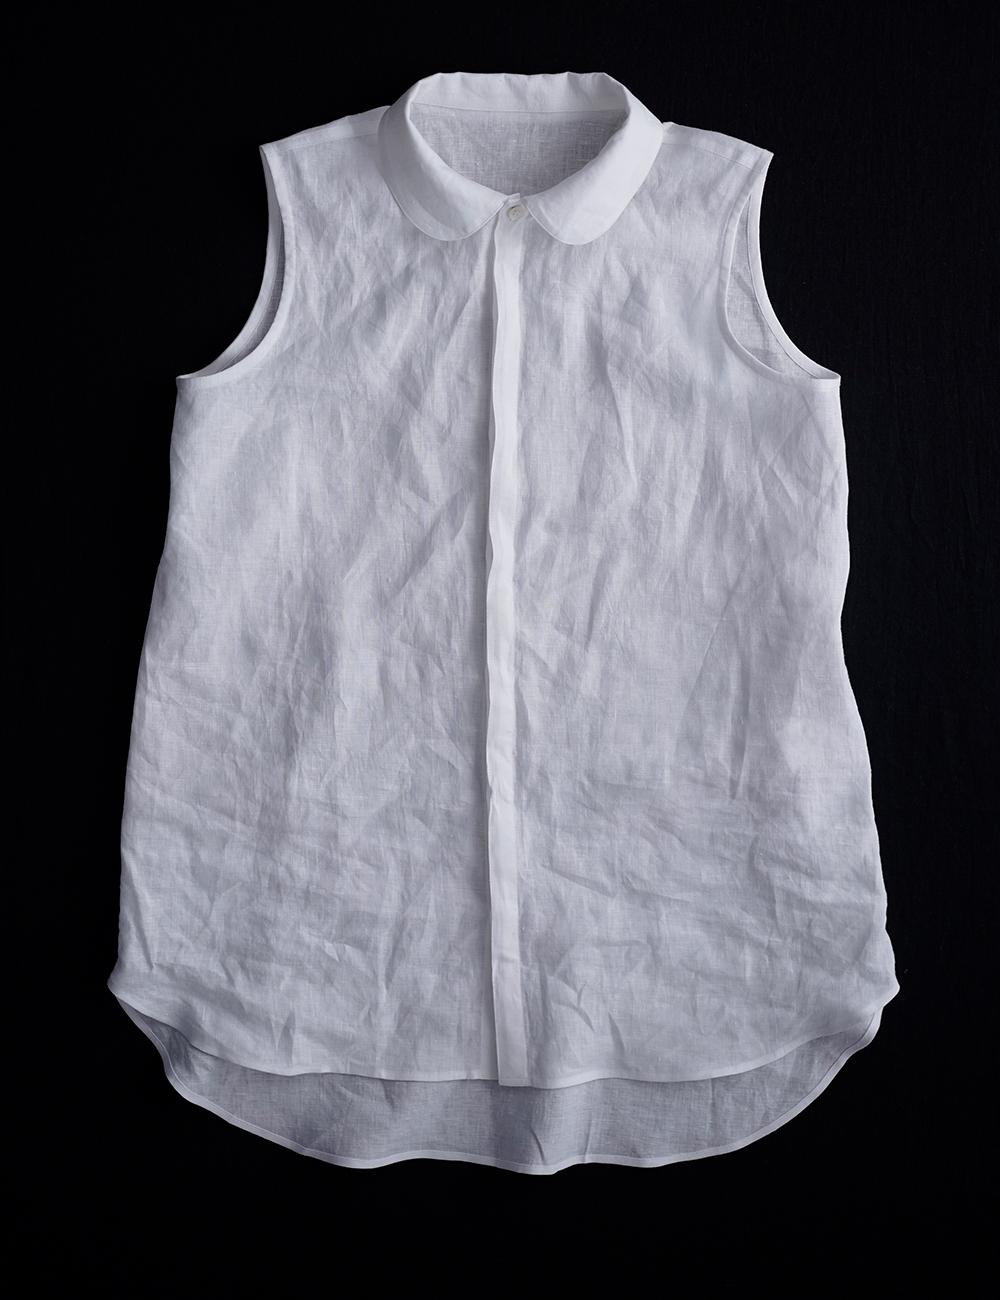 【wafu】雅亜麻 linen shirt  丸襟 比翼 シャツ  インナーとしても/白色 p018a-wht1